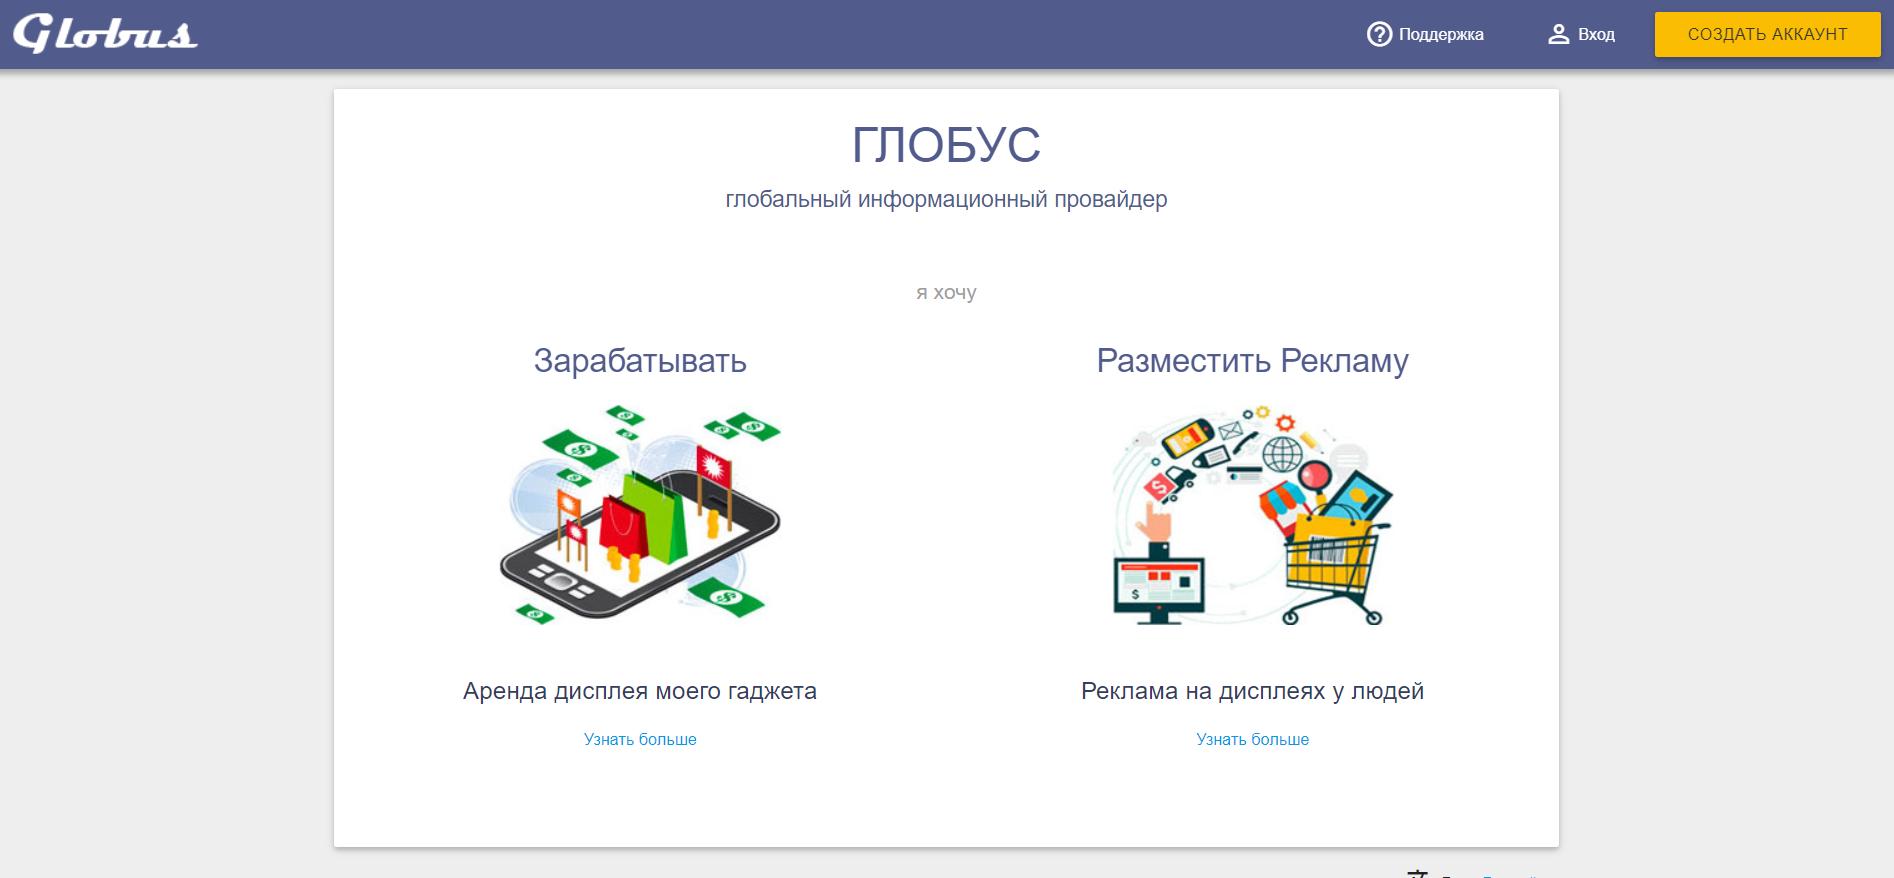 globus inter com Глобус Интерком